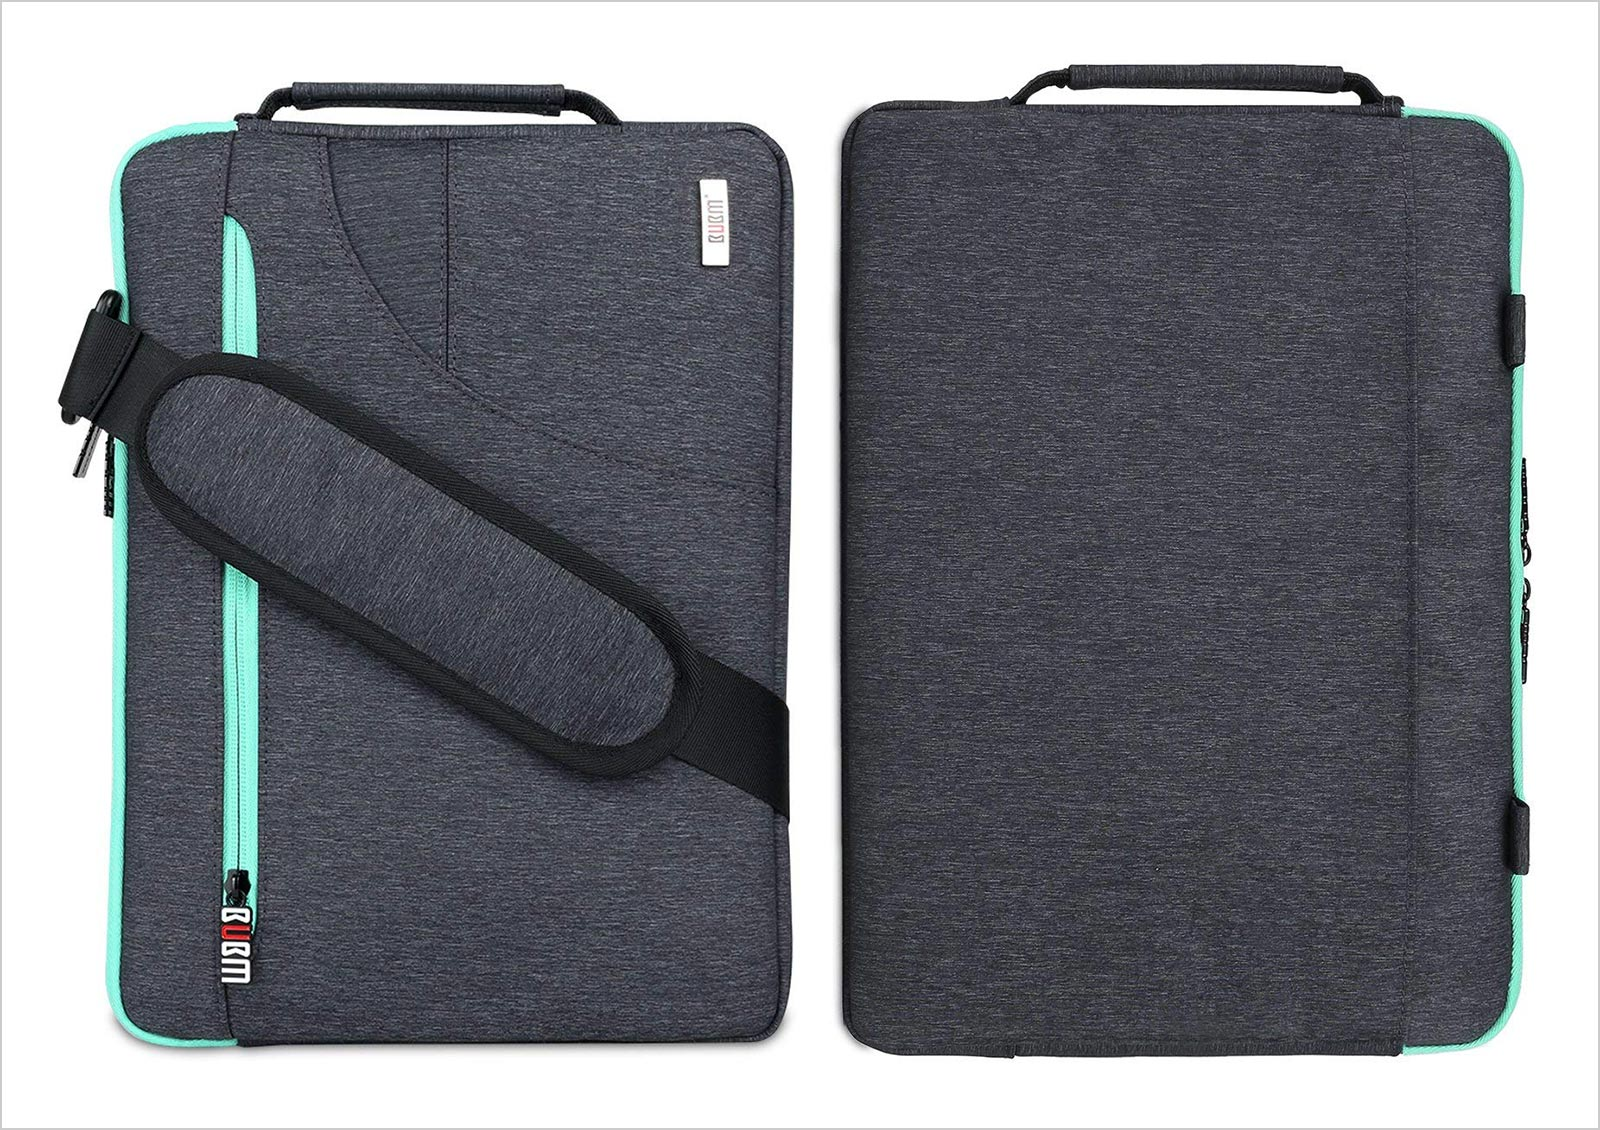 Travel-13-3-inch-Laptop-Sleeve-Shoulder-Handbag-Compatible-for-12inch-MacBook-Pro-12-9-inch-iPad-Pro